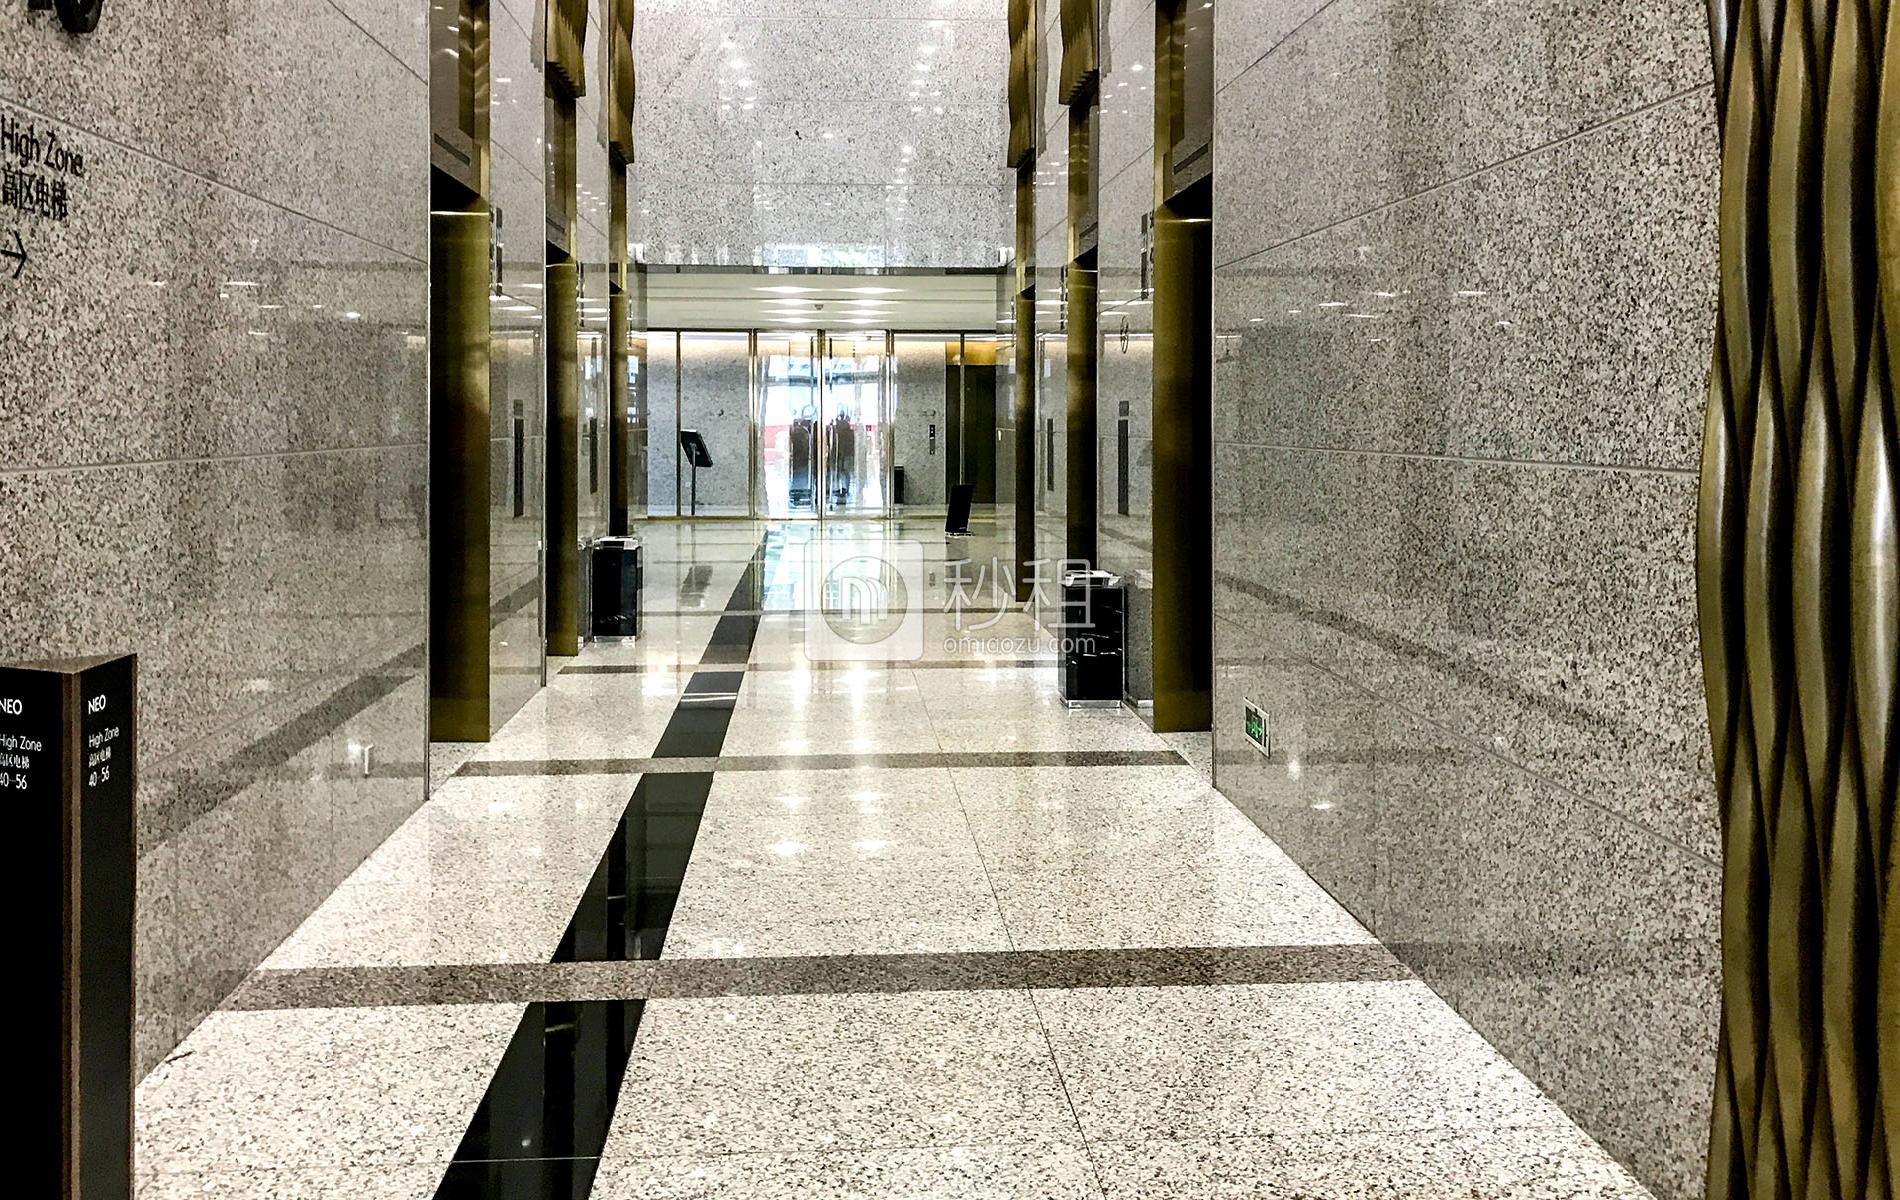 NEO大厦写字楼出租/招租/租赁,NEO大厦办公室出租/招租/租赁